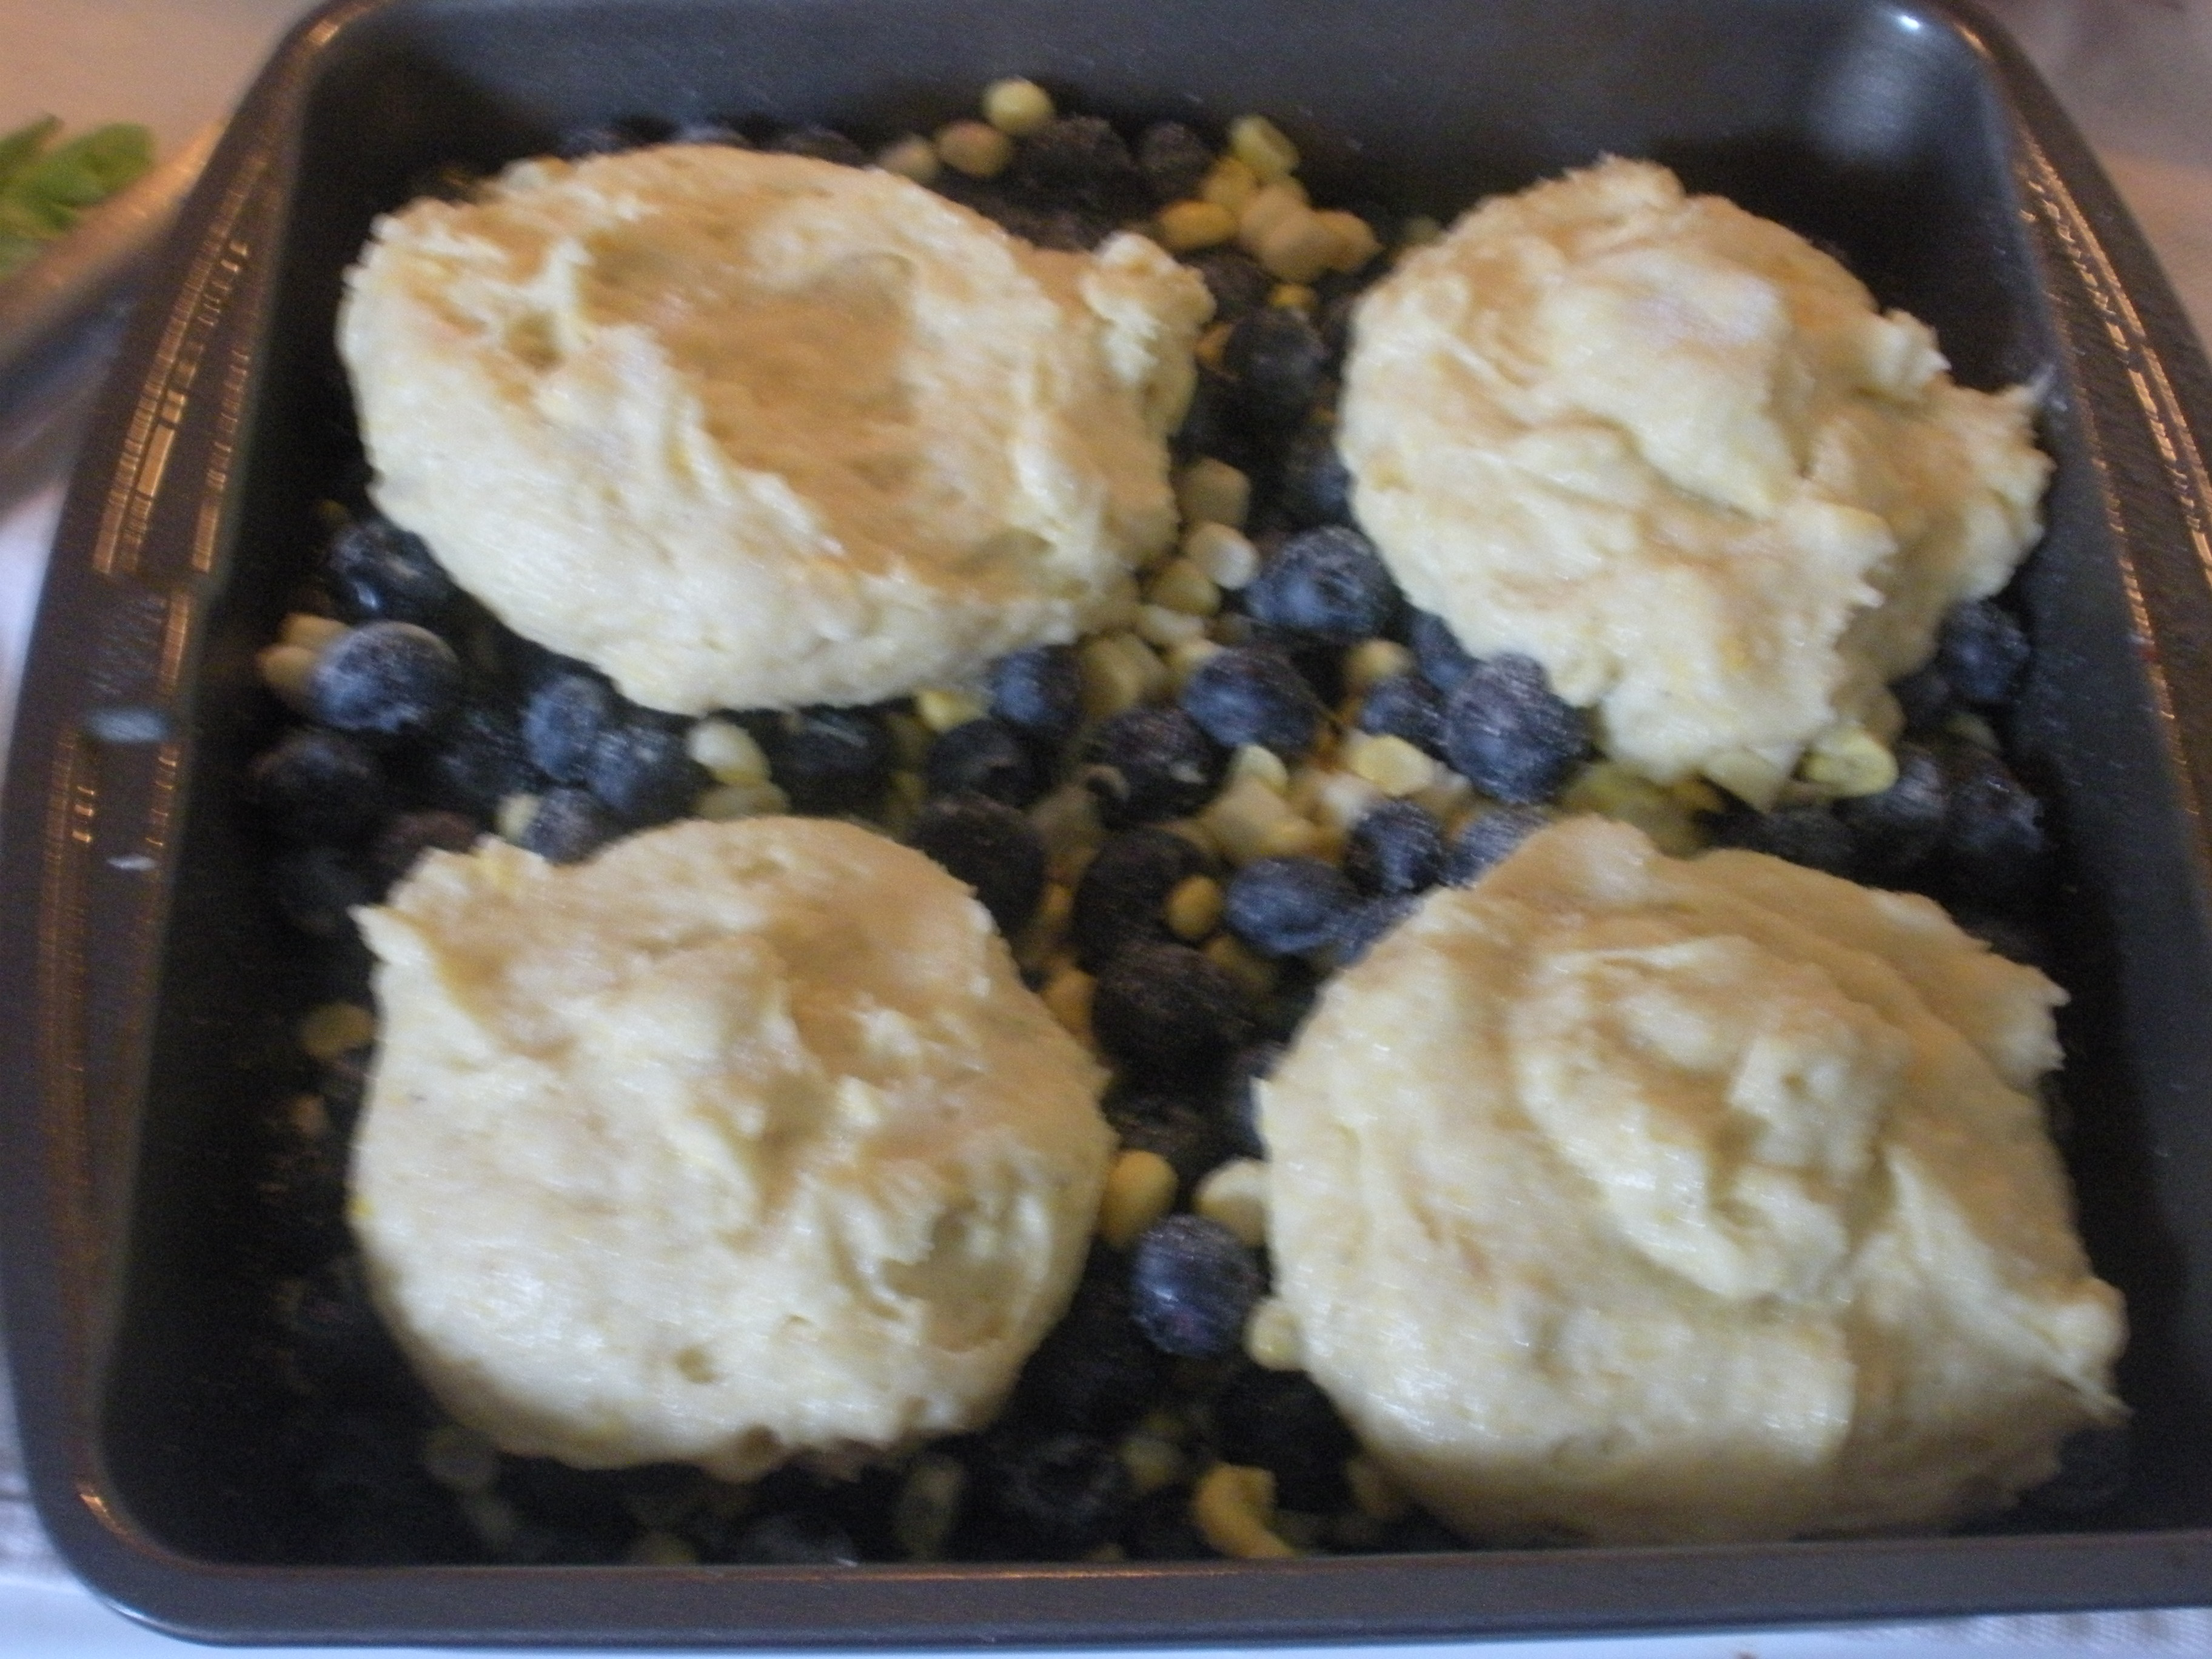 Corny Blueberry Cobbler